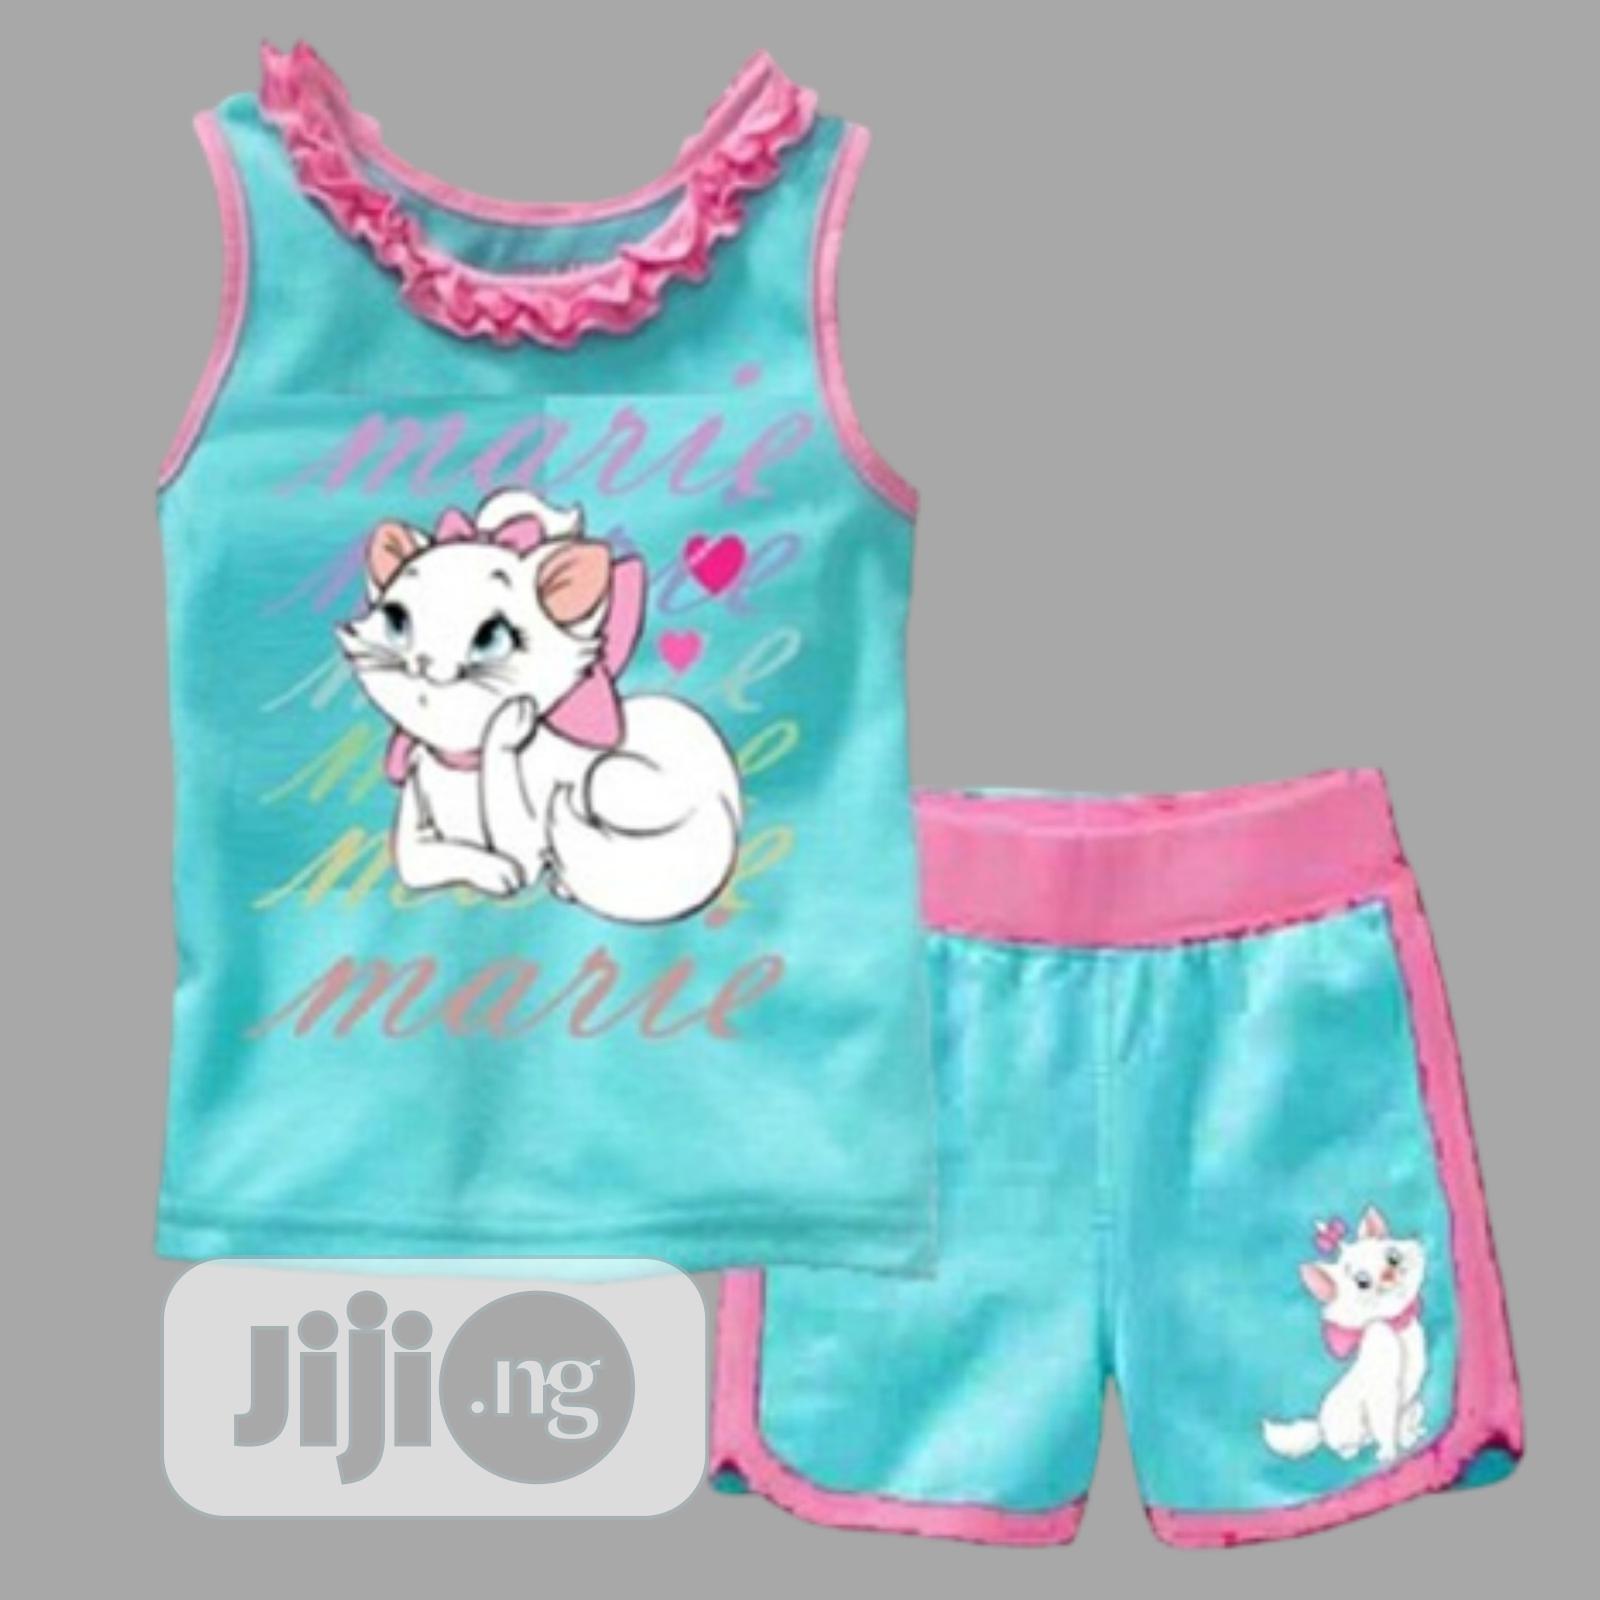 Archive: Cute Kitty Pyjamas Age 2 to 7